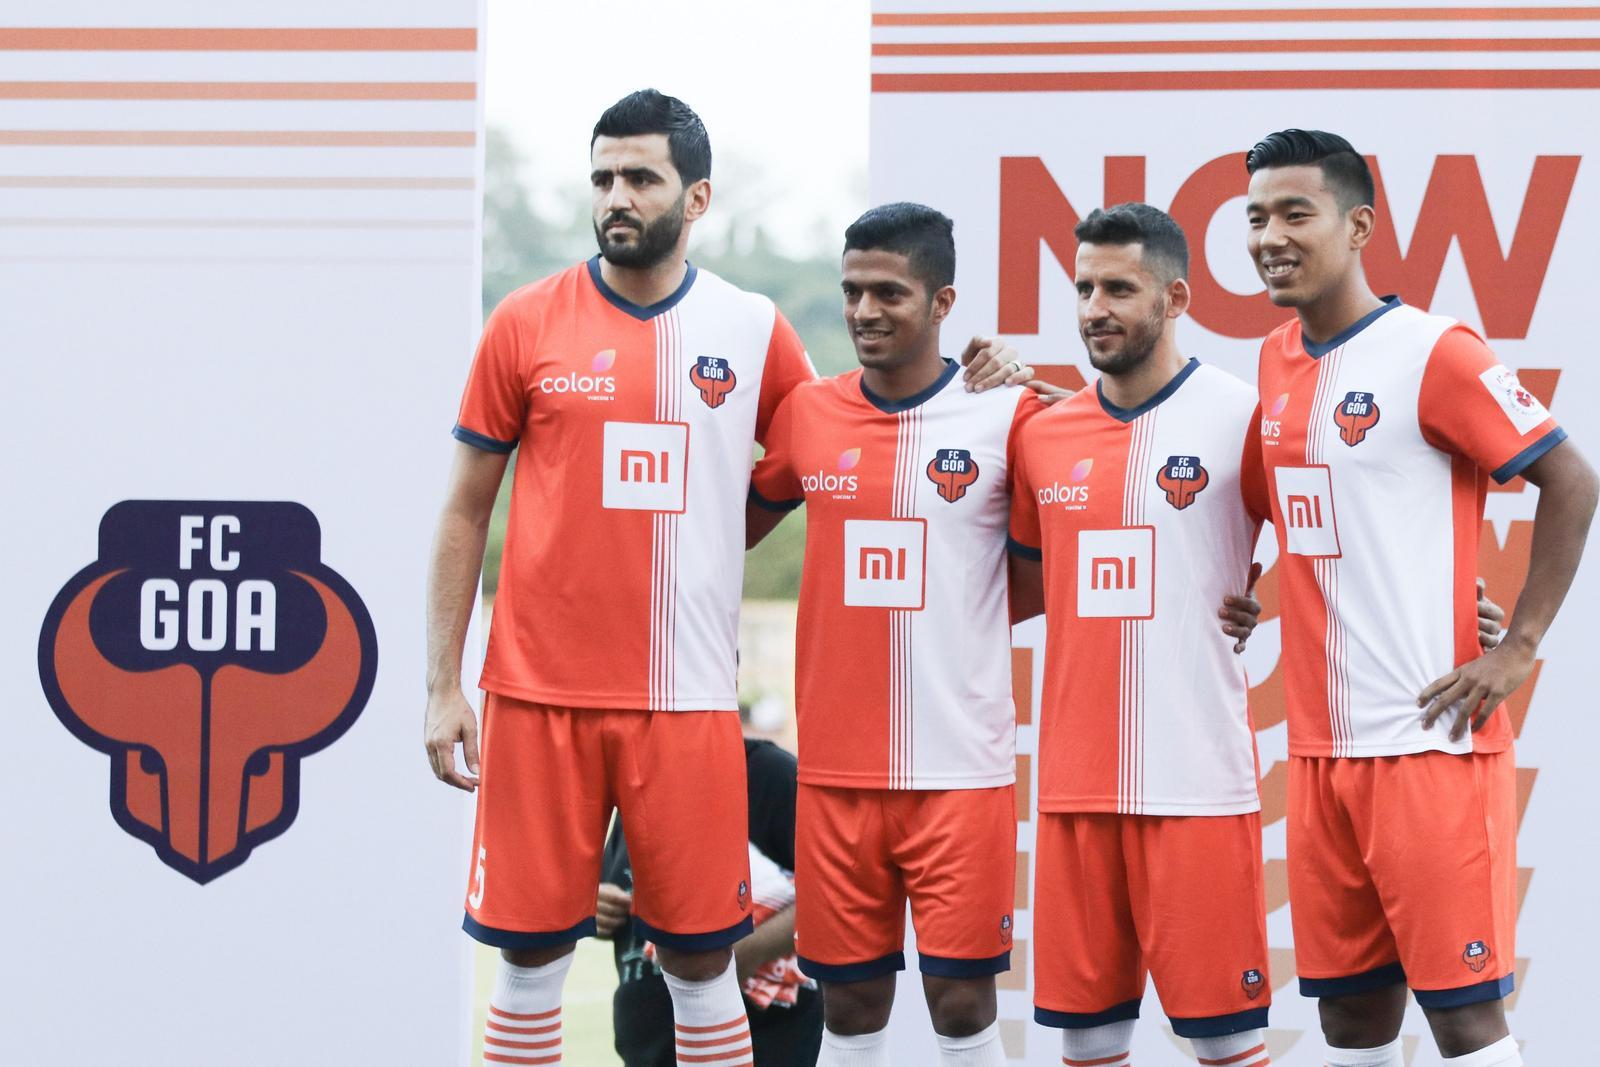 59b59ae13 FC Goa Reveal Their 2018 19 Bright Orange Home Kit